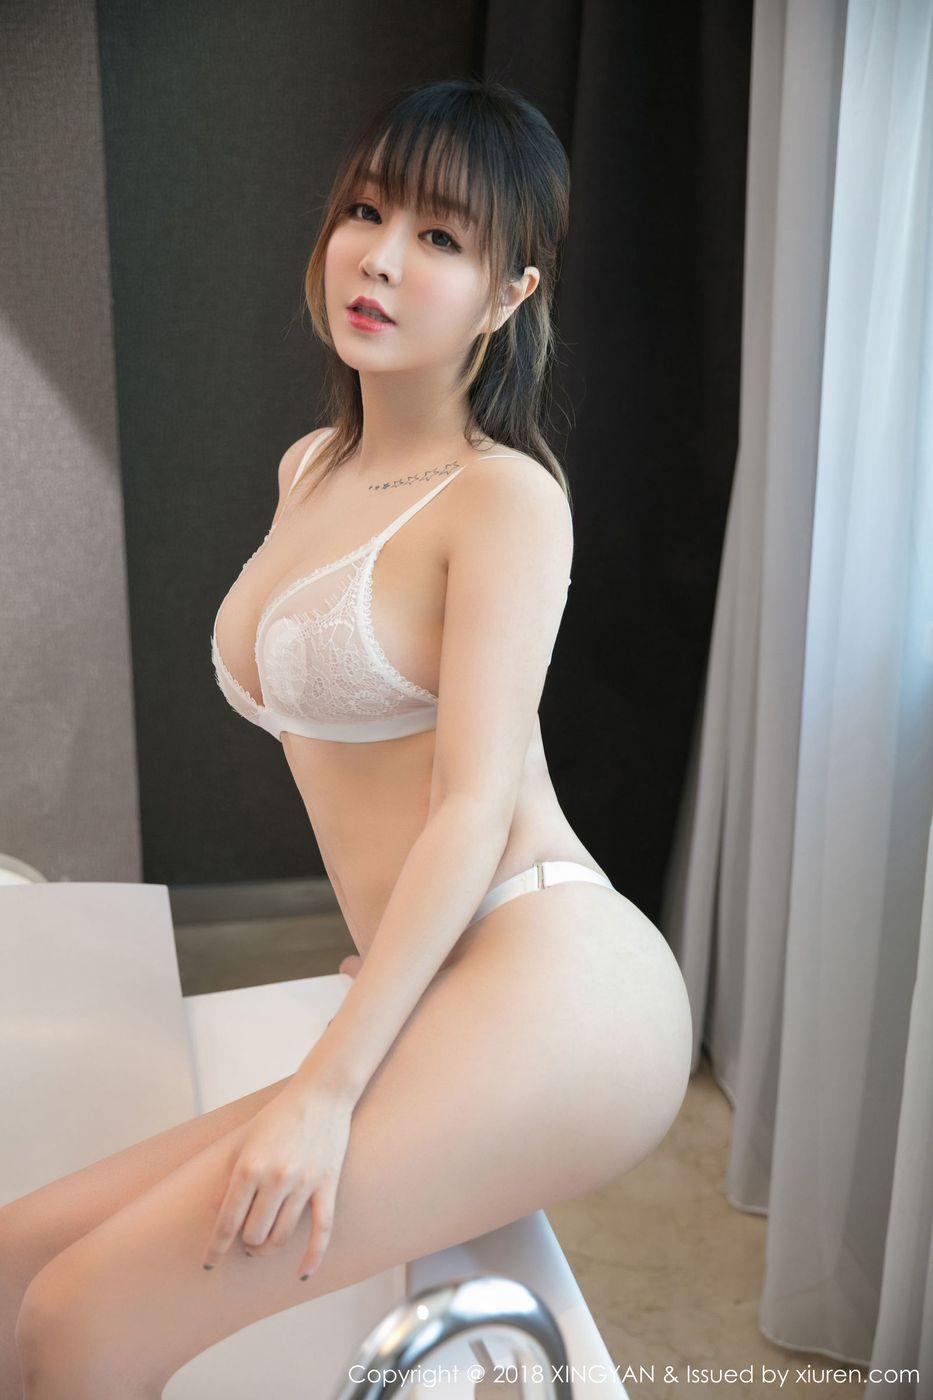 [XINGYAN星颜社] 性感女神王雨纯白色蕾丝内衣诱惑爆乳美腿写真 Vol.076